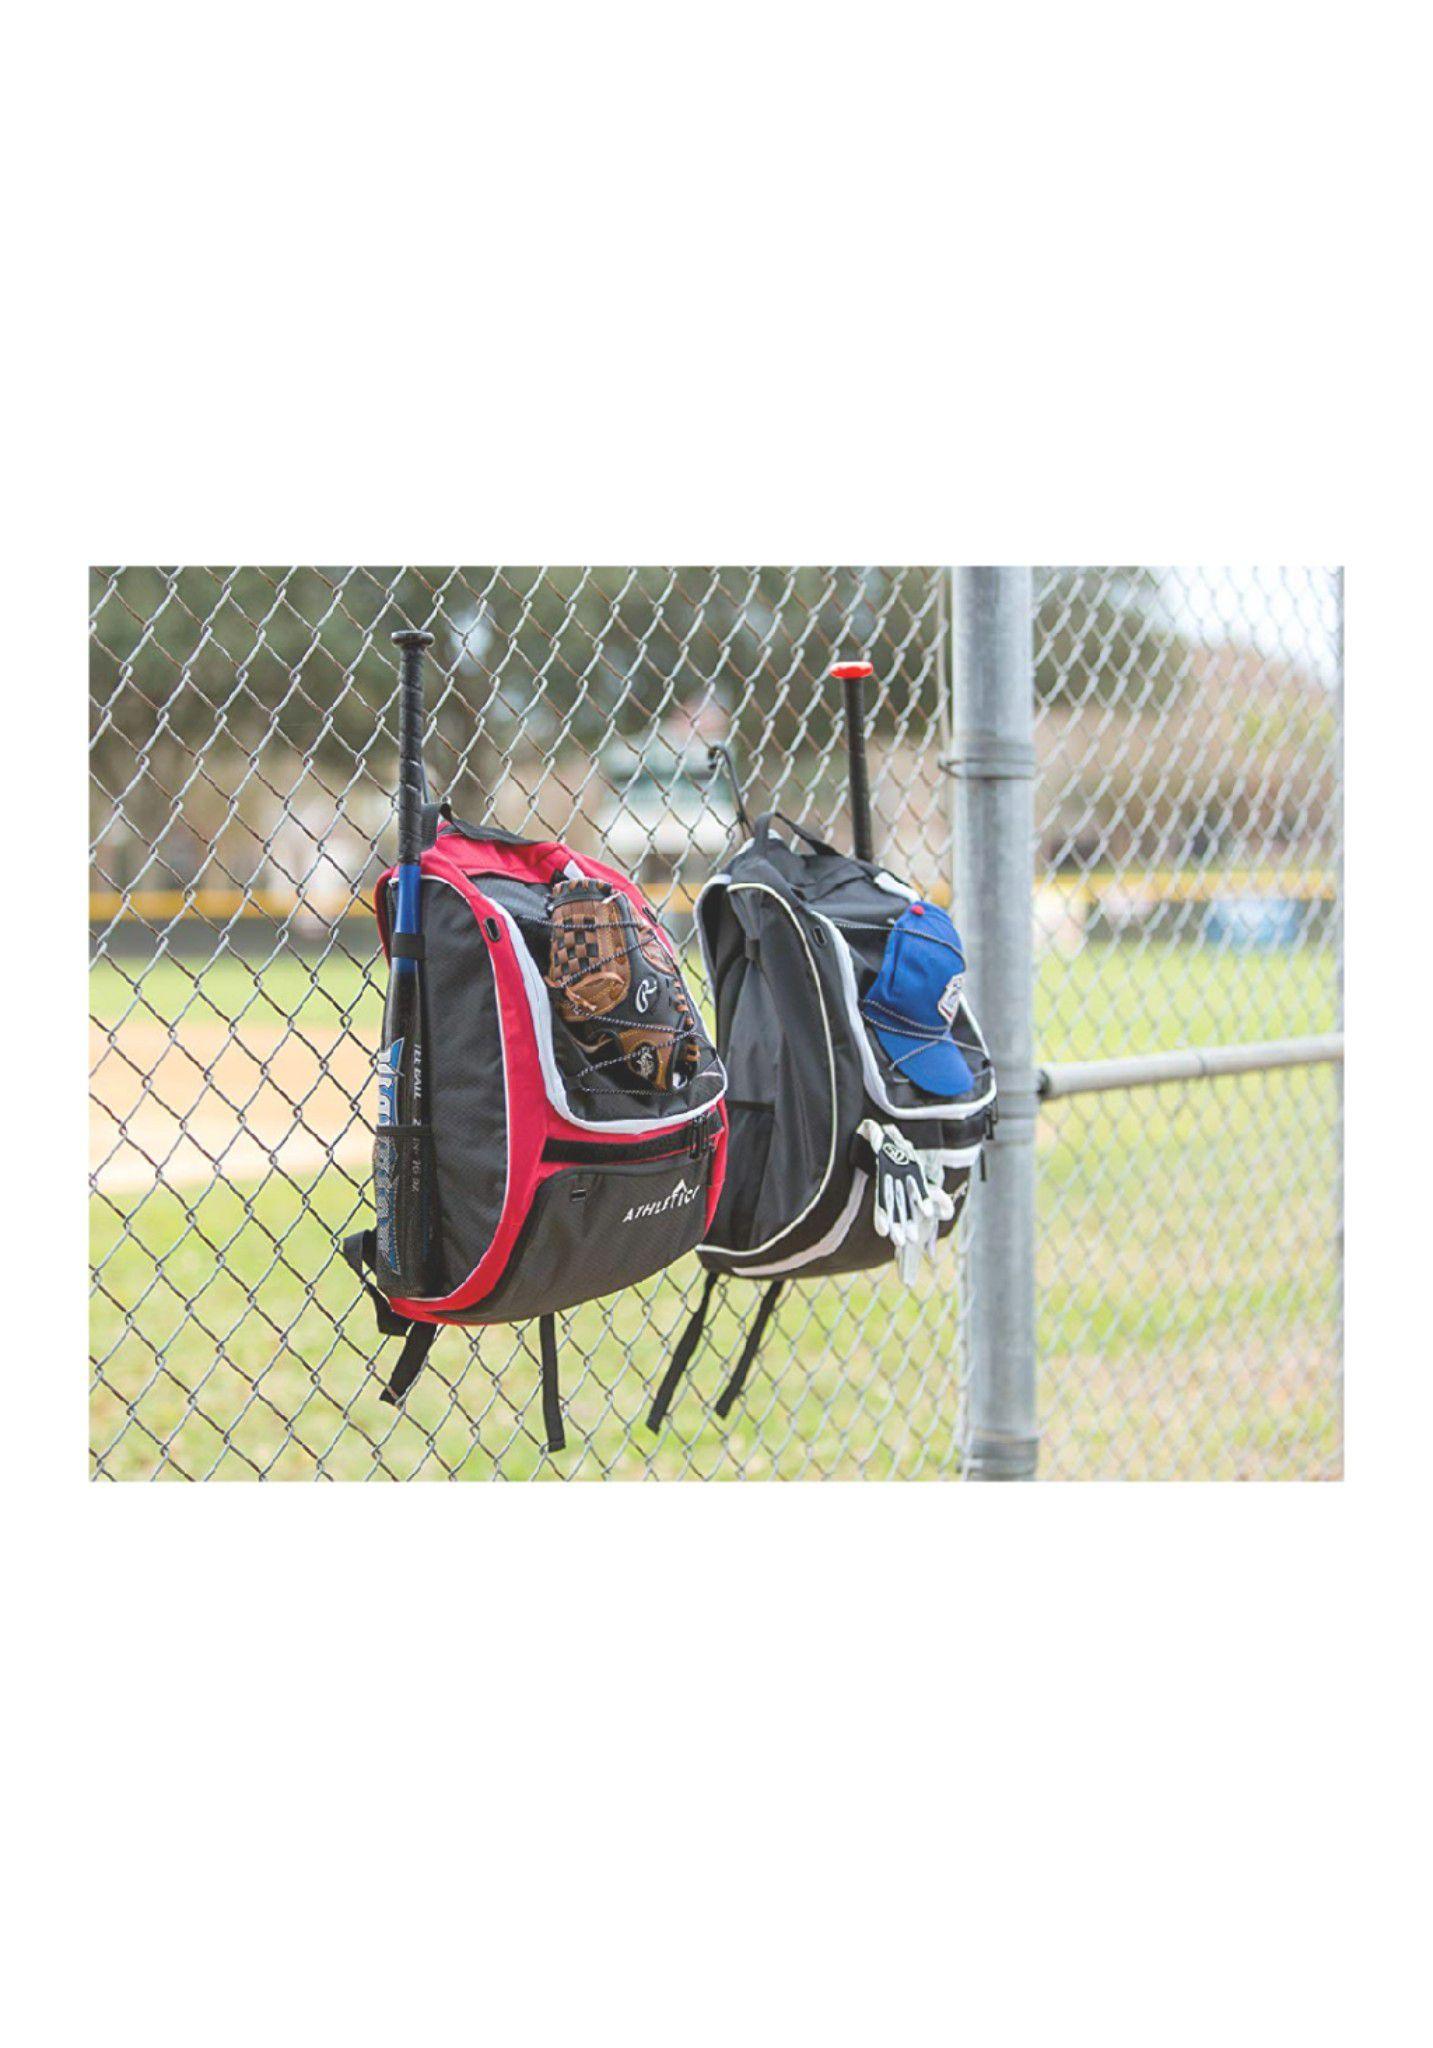 Athletico baseball, softball backpack